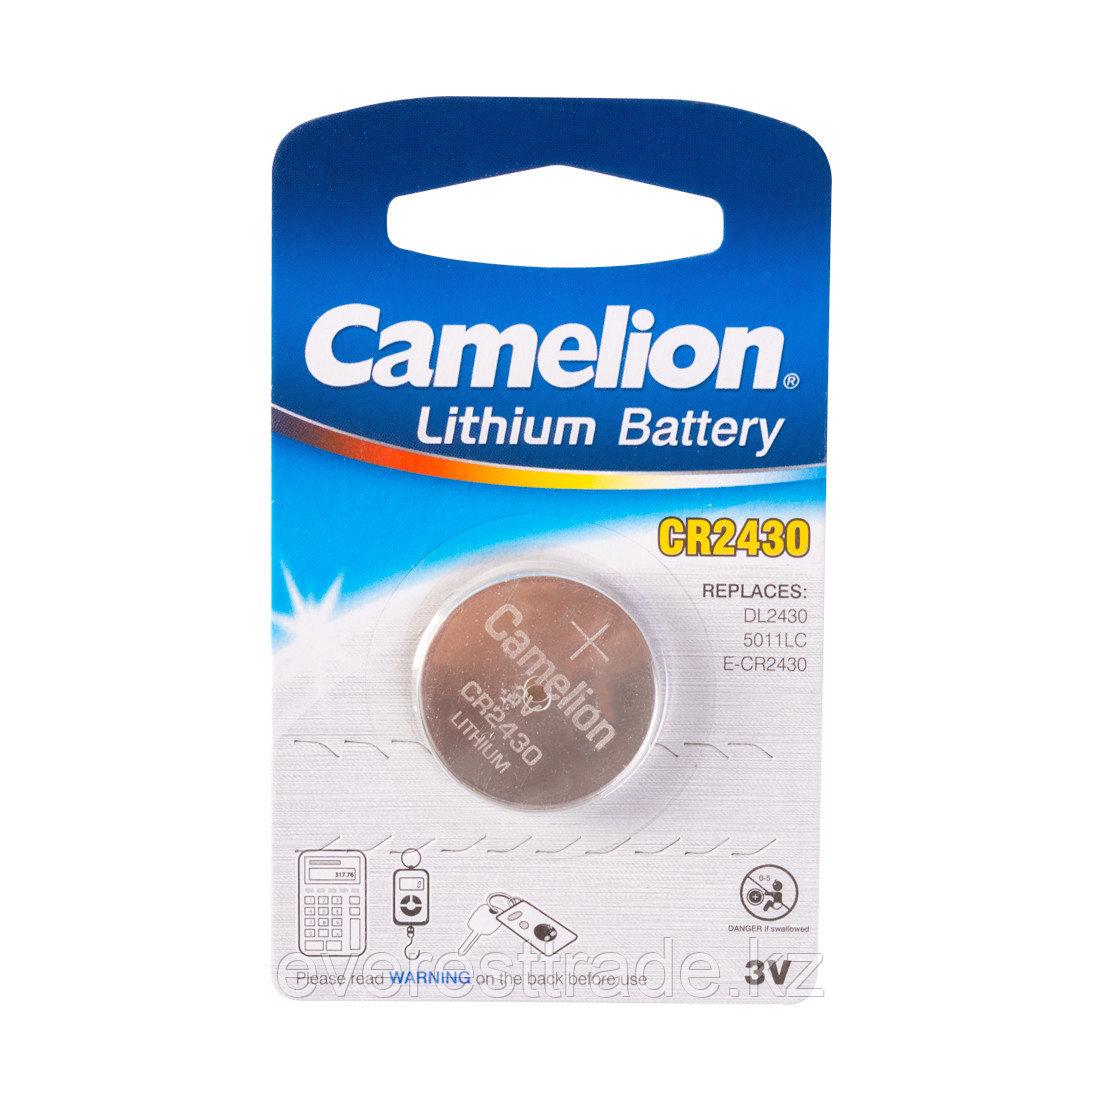 Camelion Батарейка, CAMELION, CR2430-BP1 Lithium Battery, CR2430, 3V, 220 mAh, 1 шт.